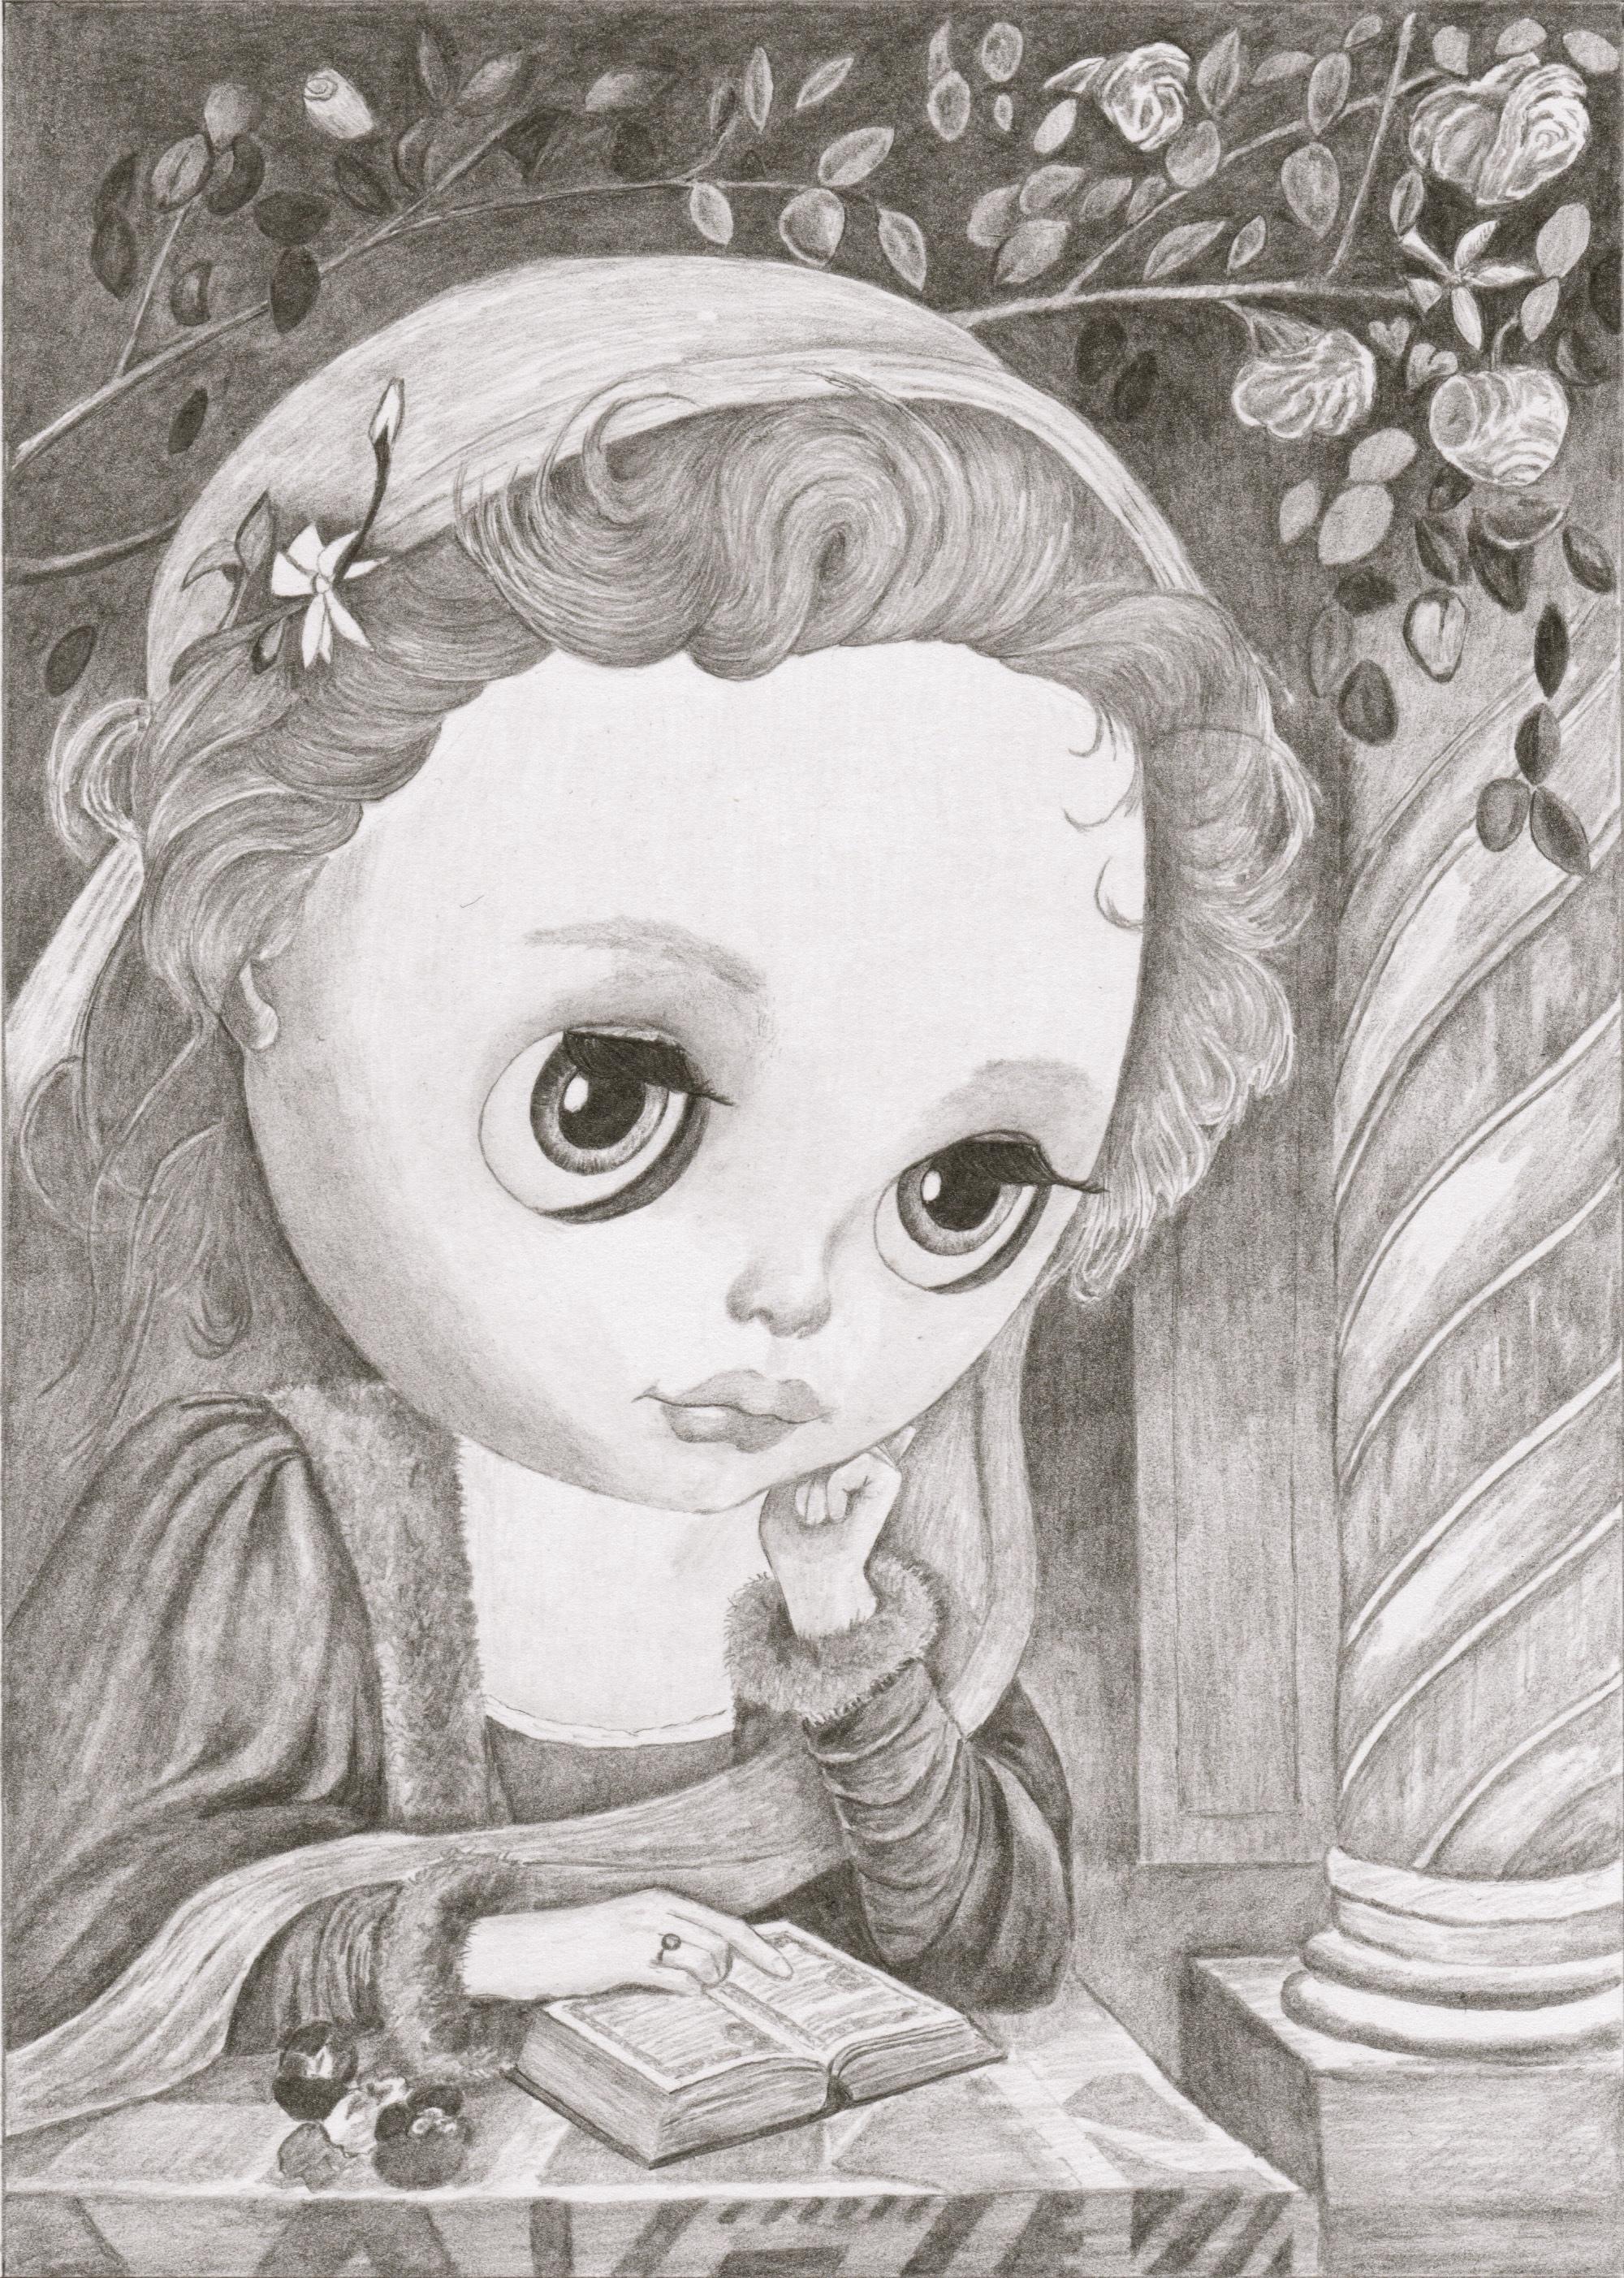 #34 Blythe as Beatrice